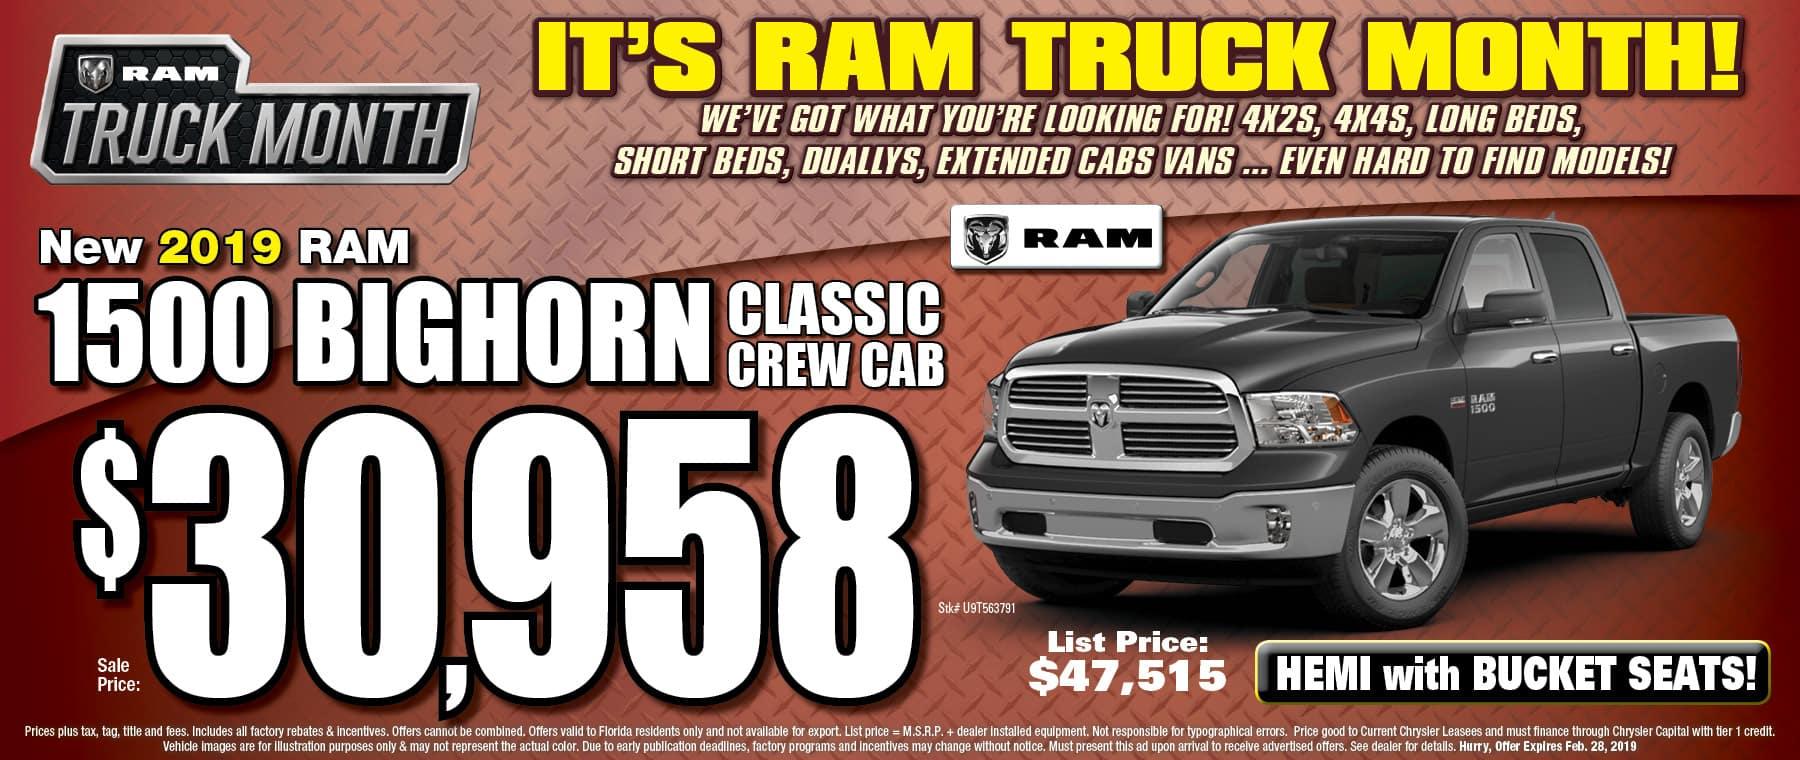 New 2019 Ram Bighorn Classic - University Dodge RAM!